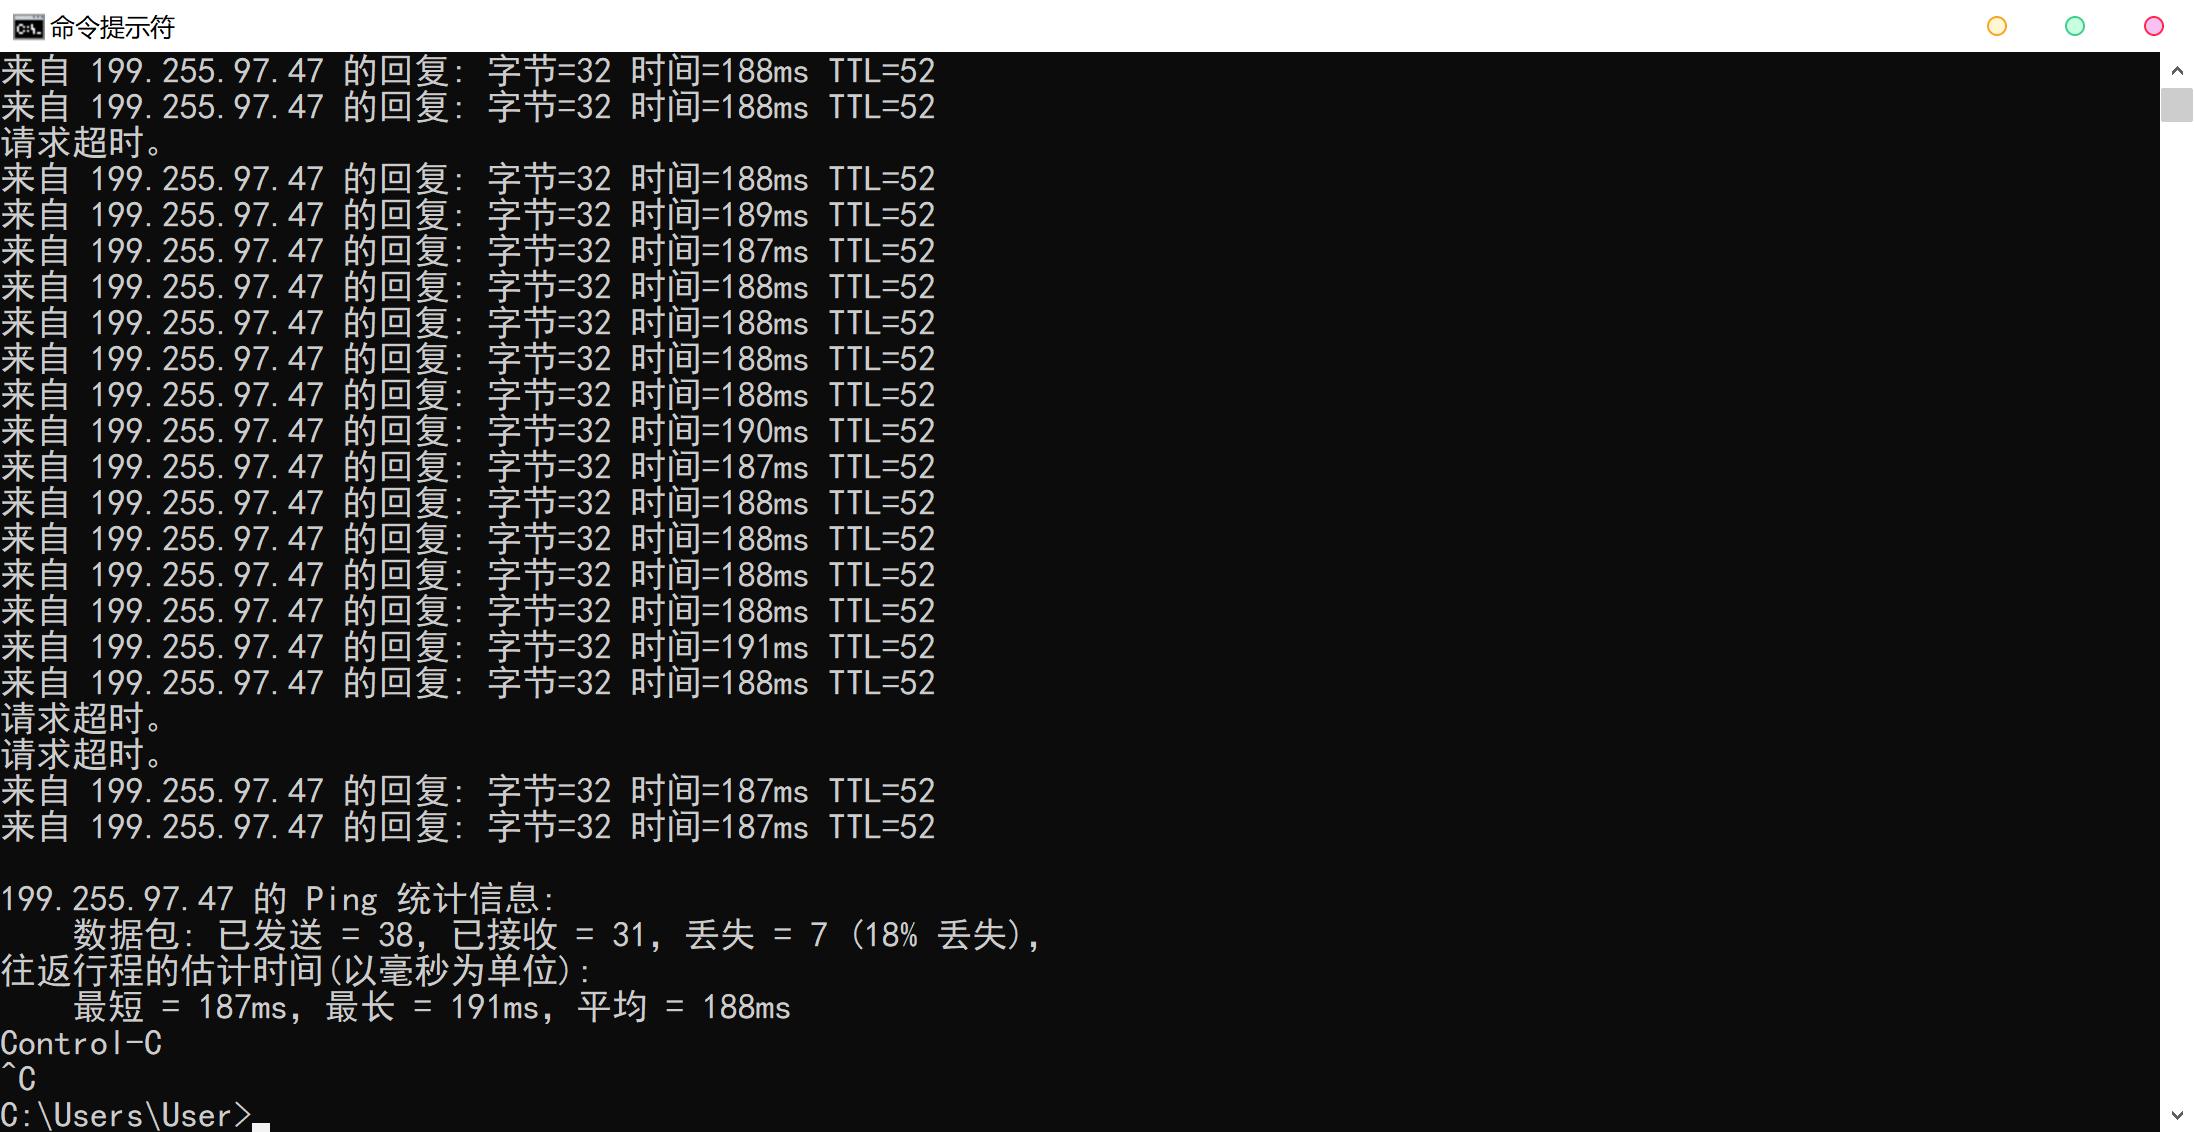 Cloudcone便宜,实际可用性差,不适合稳定建站